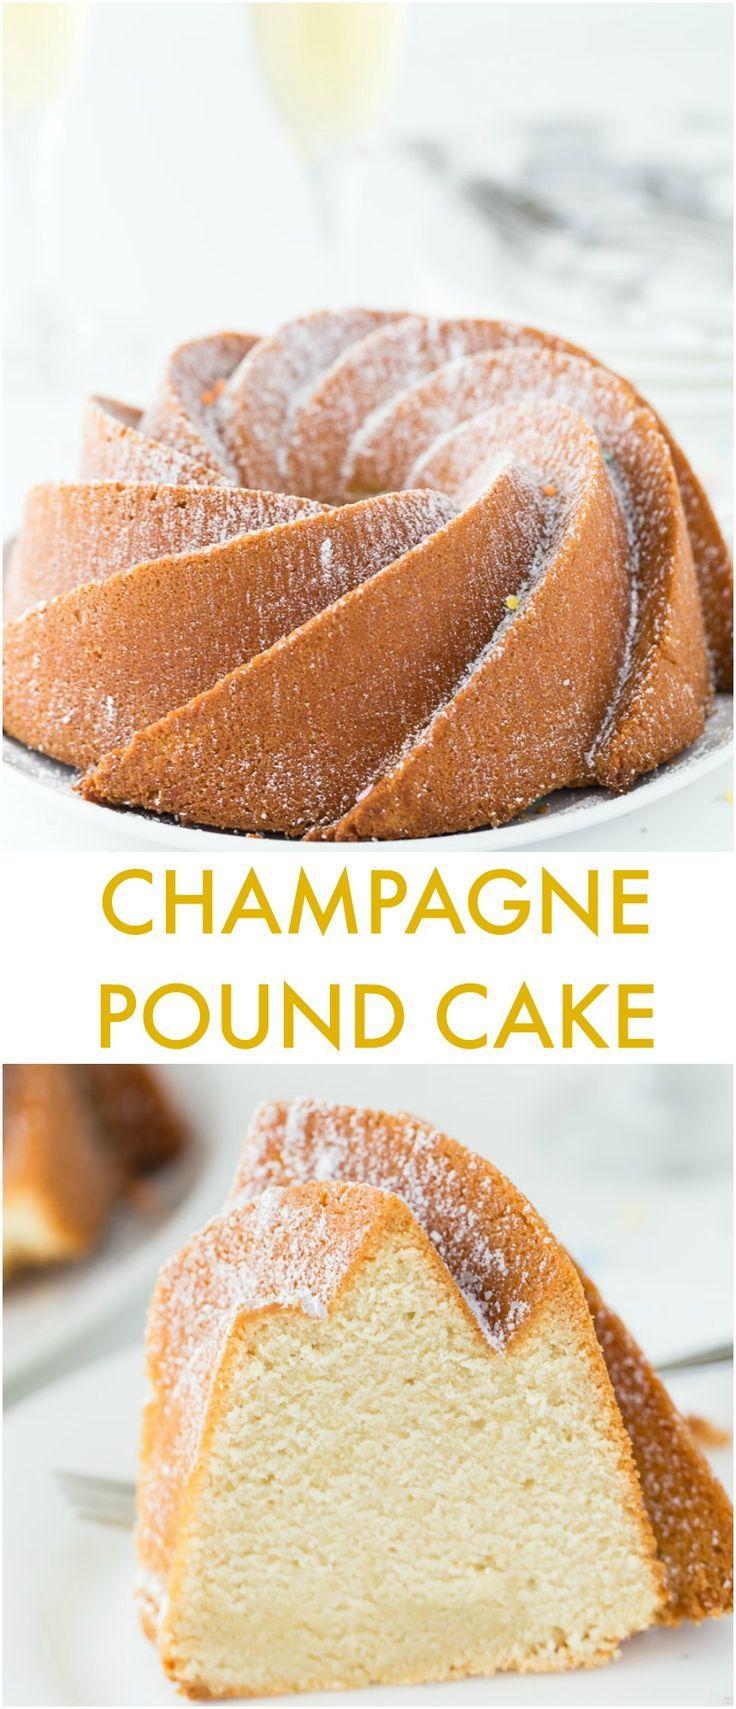 champagne pound cake rezept rezepte gugelhupf pinterest kuchen marmorkuchen und gugelhupf. Black Bedroom Furniture Sets. Home Design Ideas